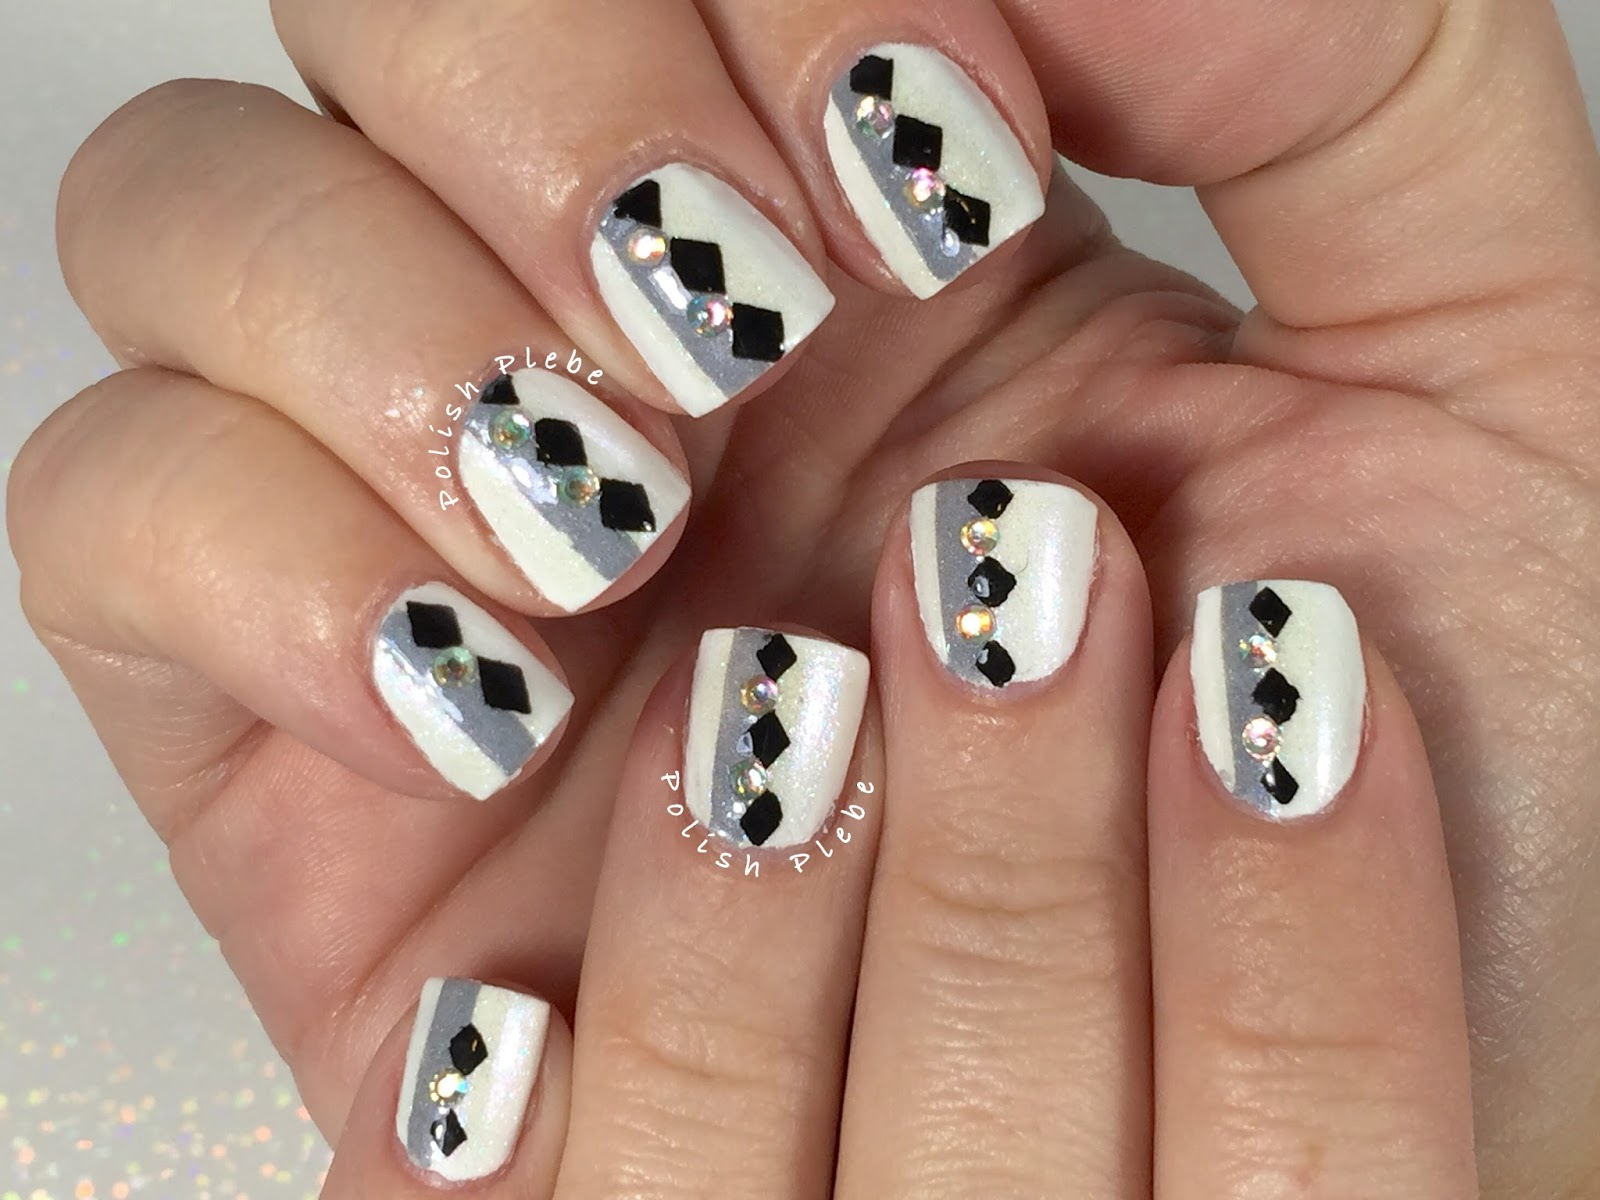 Nails Art: Art Deco Inspired Nails